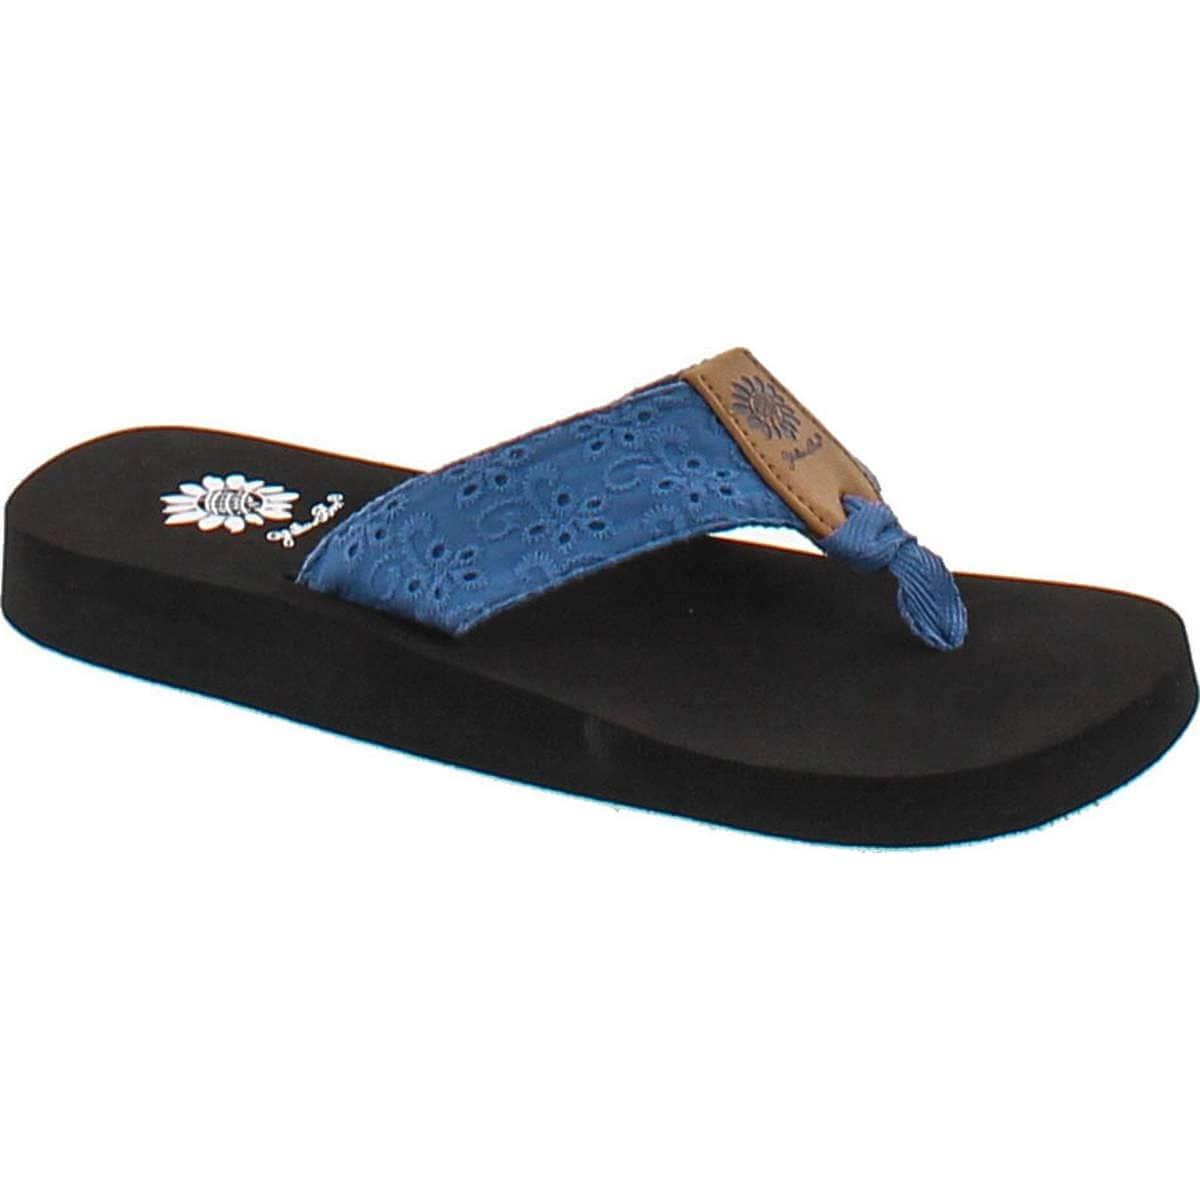 9b206201f522 Buy Yellow Box Women s Sandals Online at Overstock